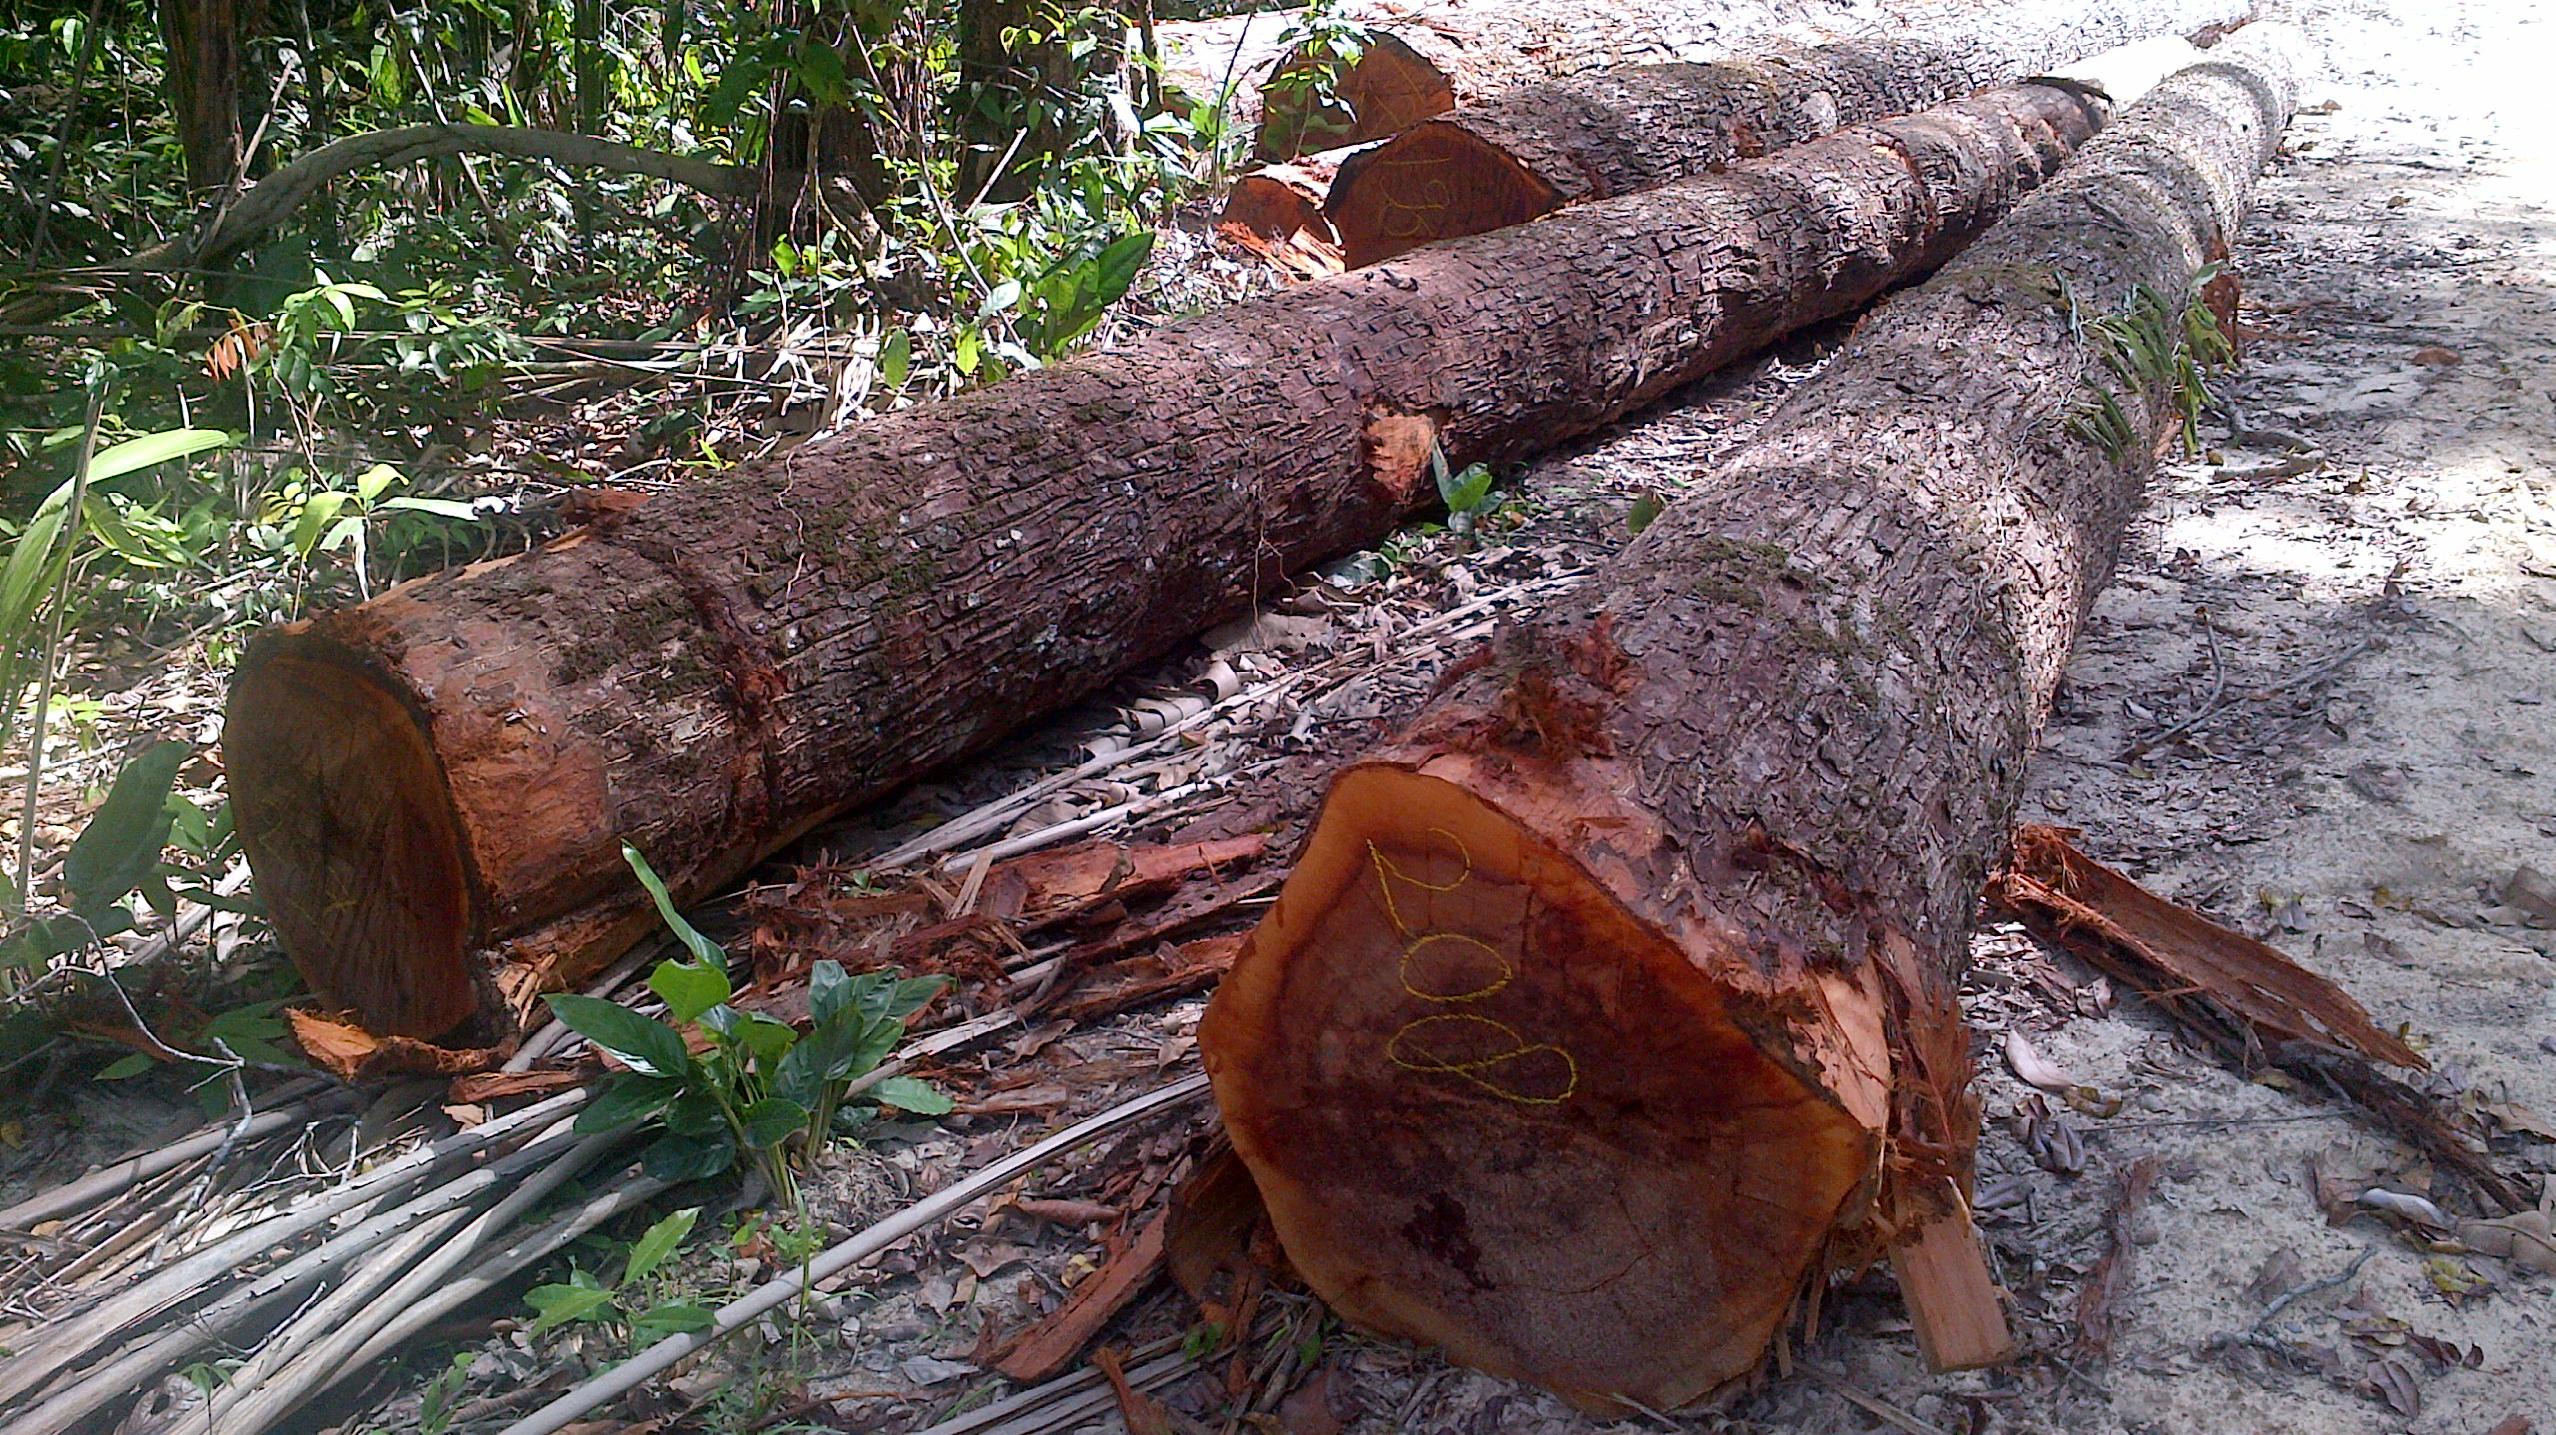 Bulletwood logs